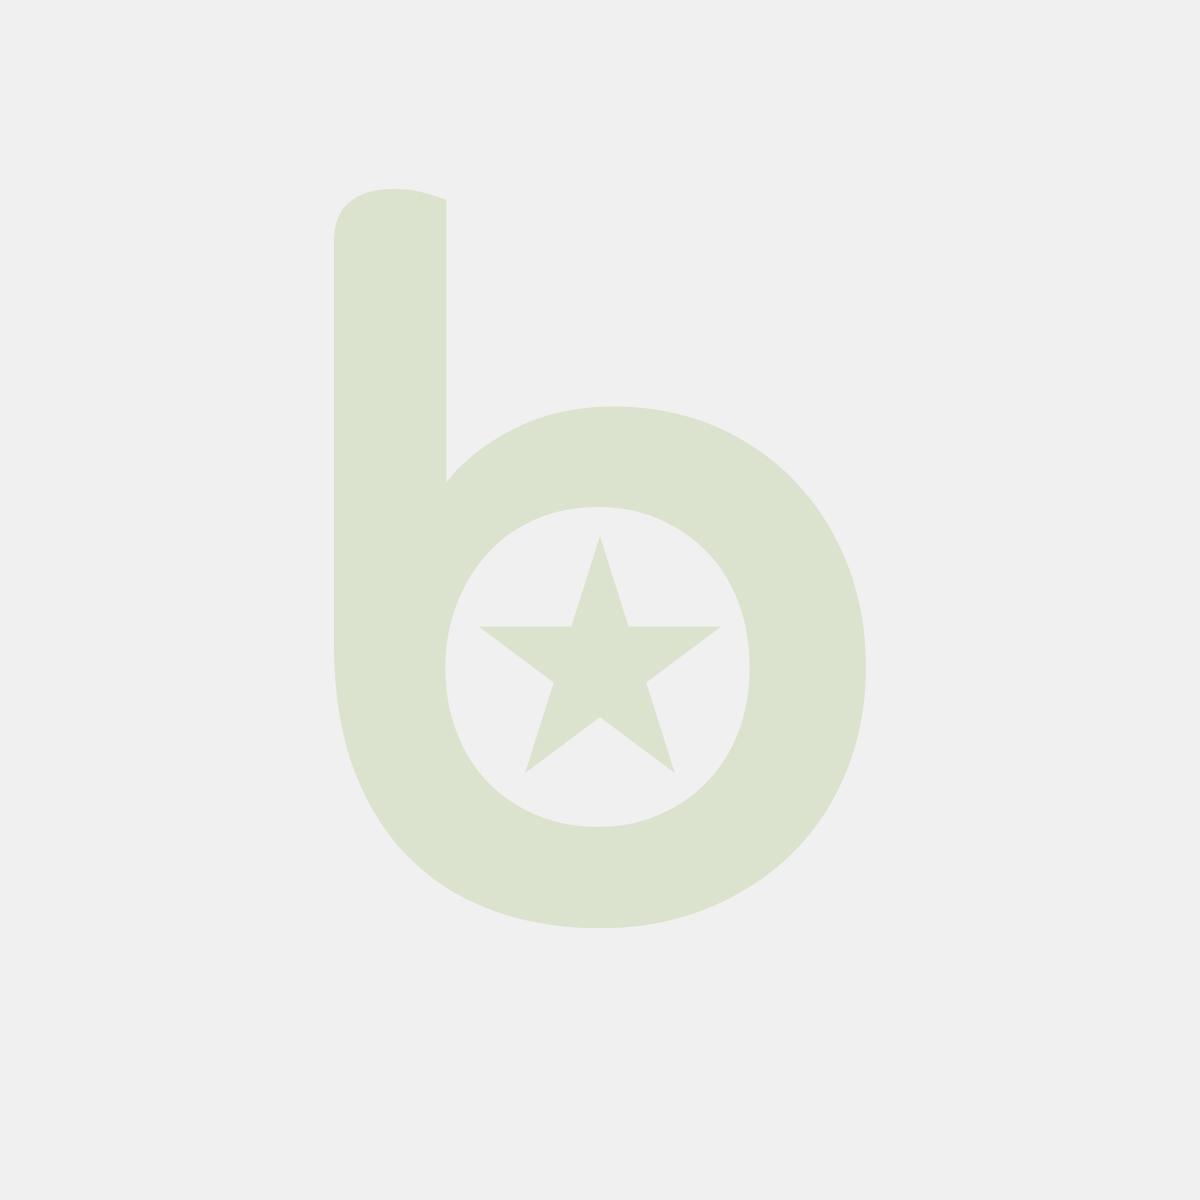 Reklamówki rolowane HDPE BARDZO GRUBE 13 mikronów -160szt